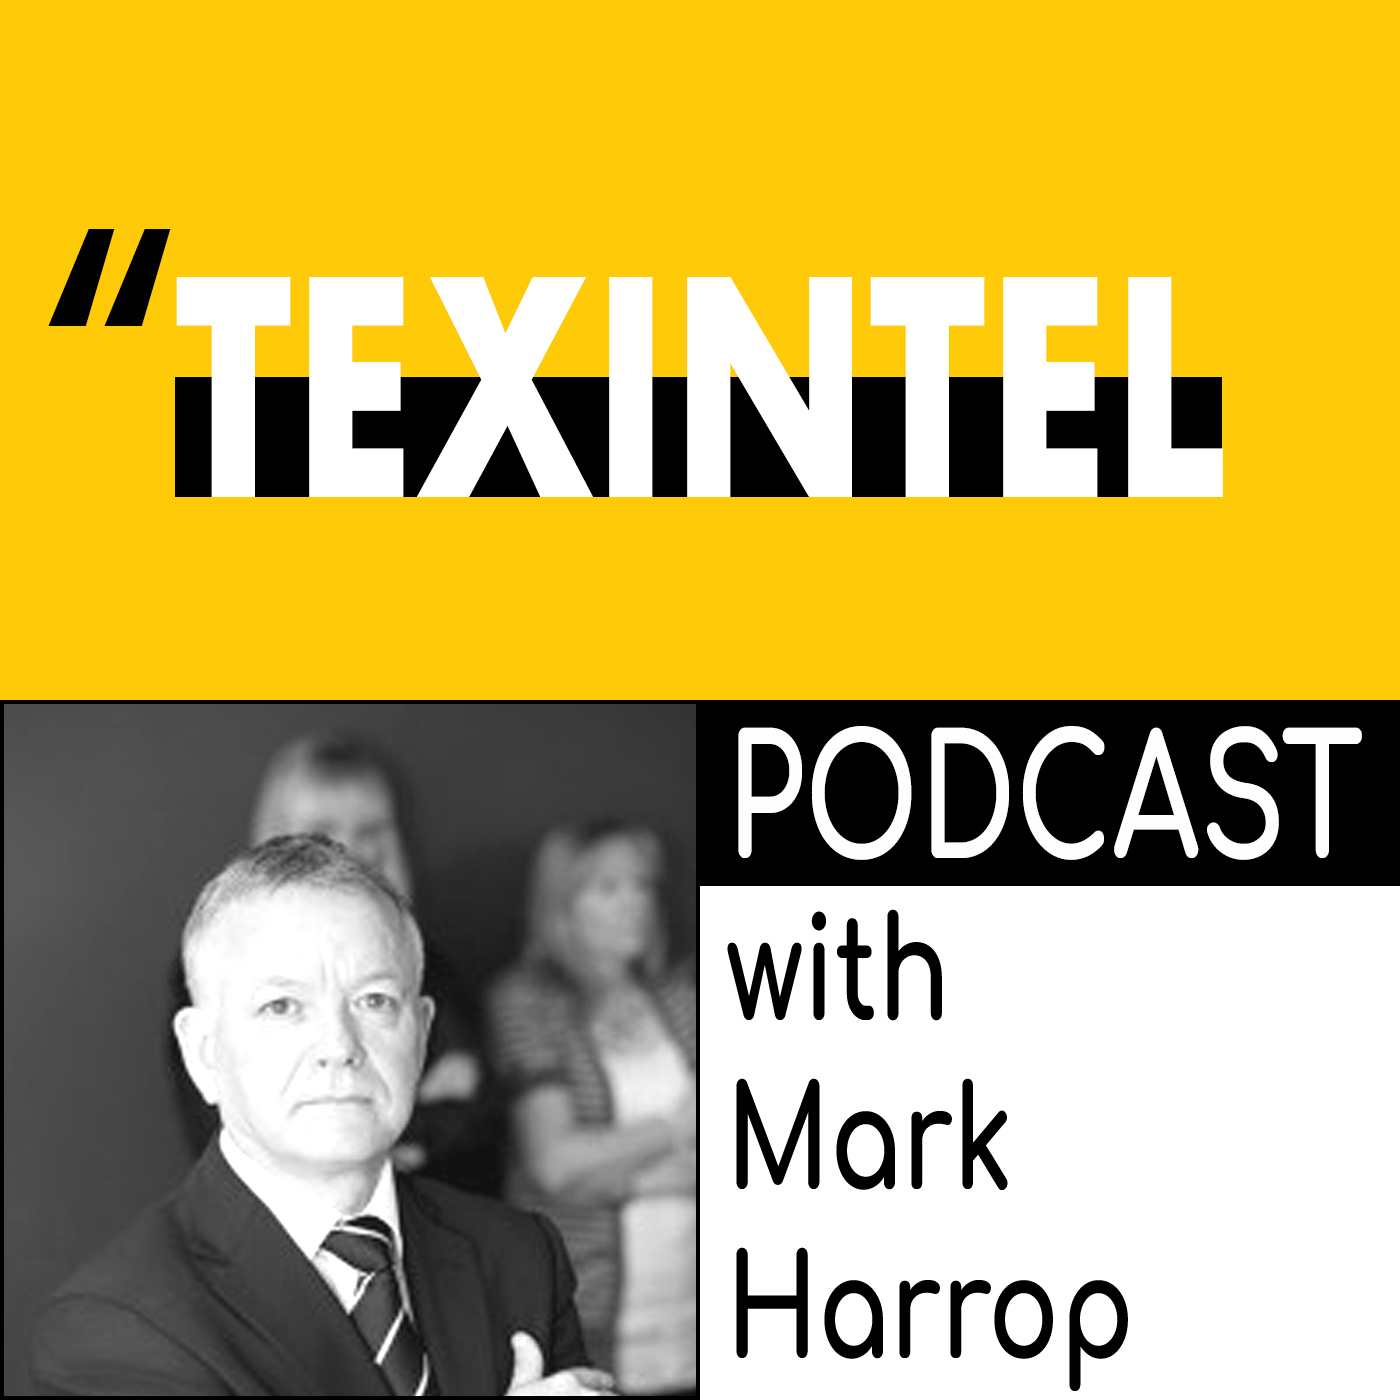 TEXINTEL PODCAST 2018-MARK HARROP.jpg